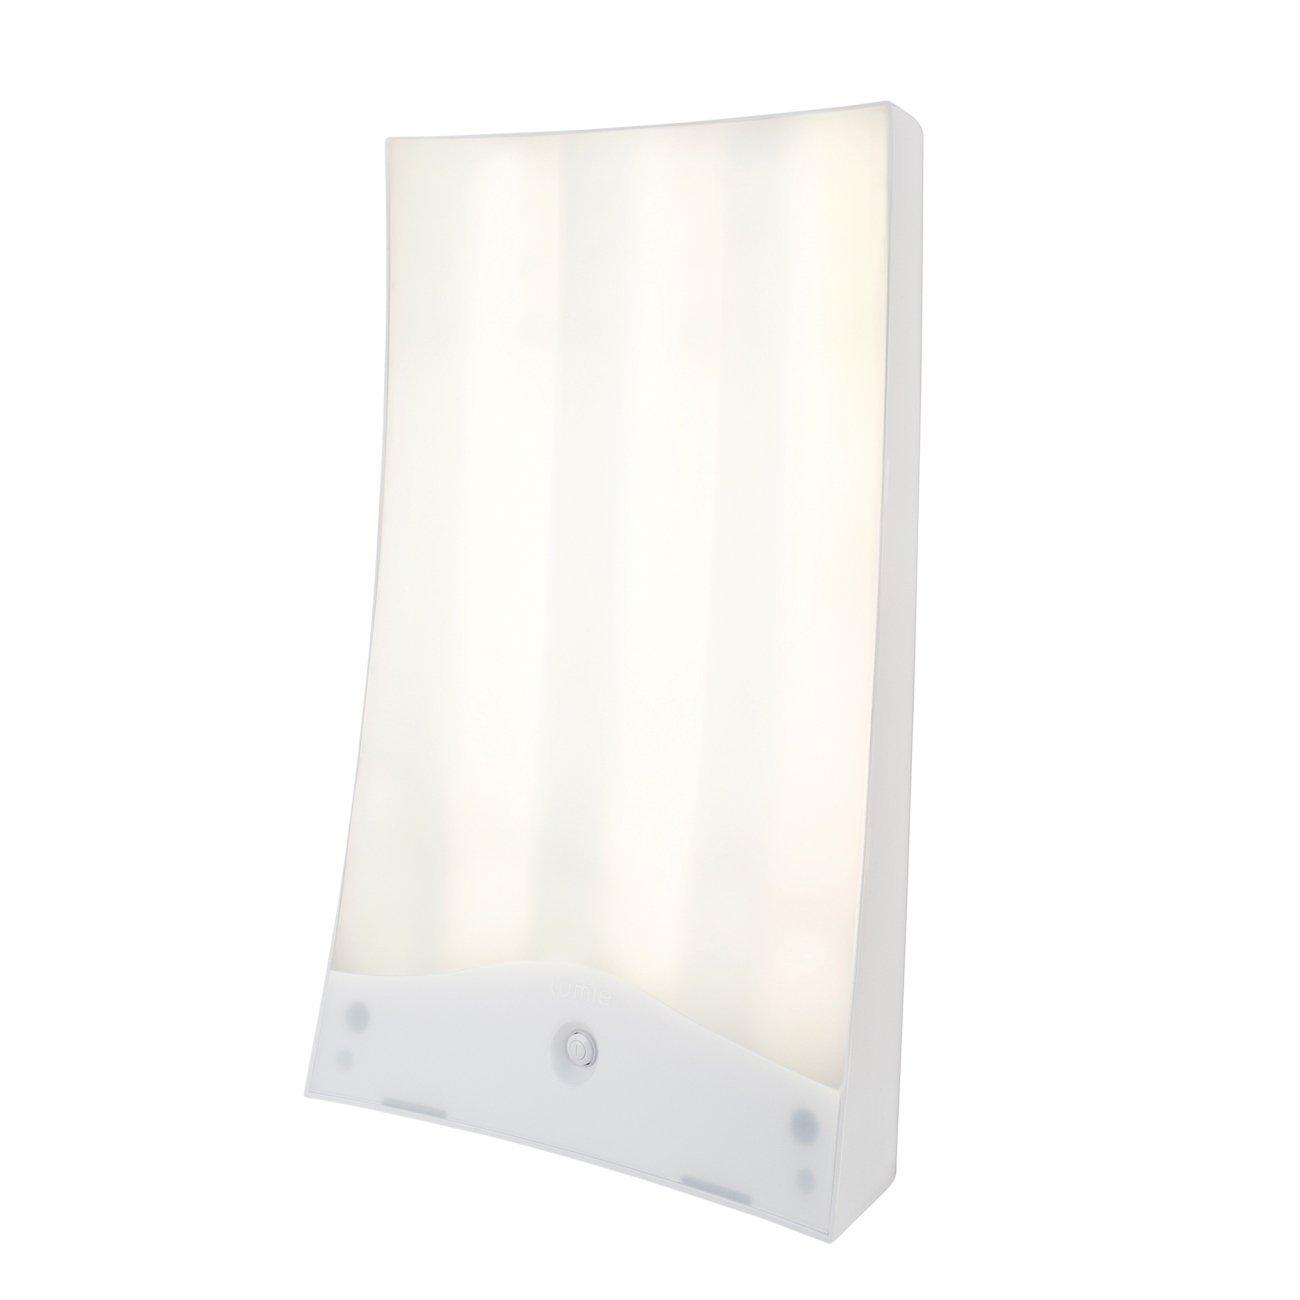 Top 5 Meilleure Lampe De Luminotherapie Avis Test Mars 2019